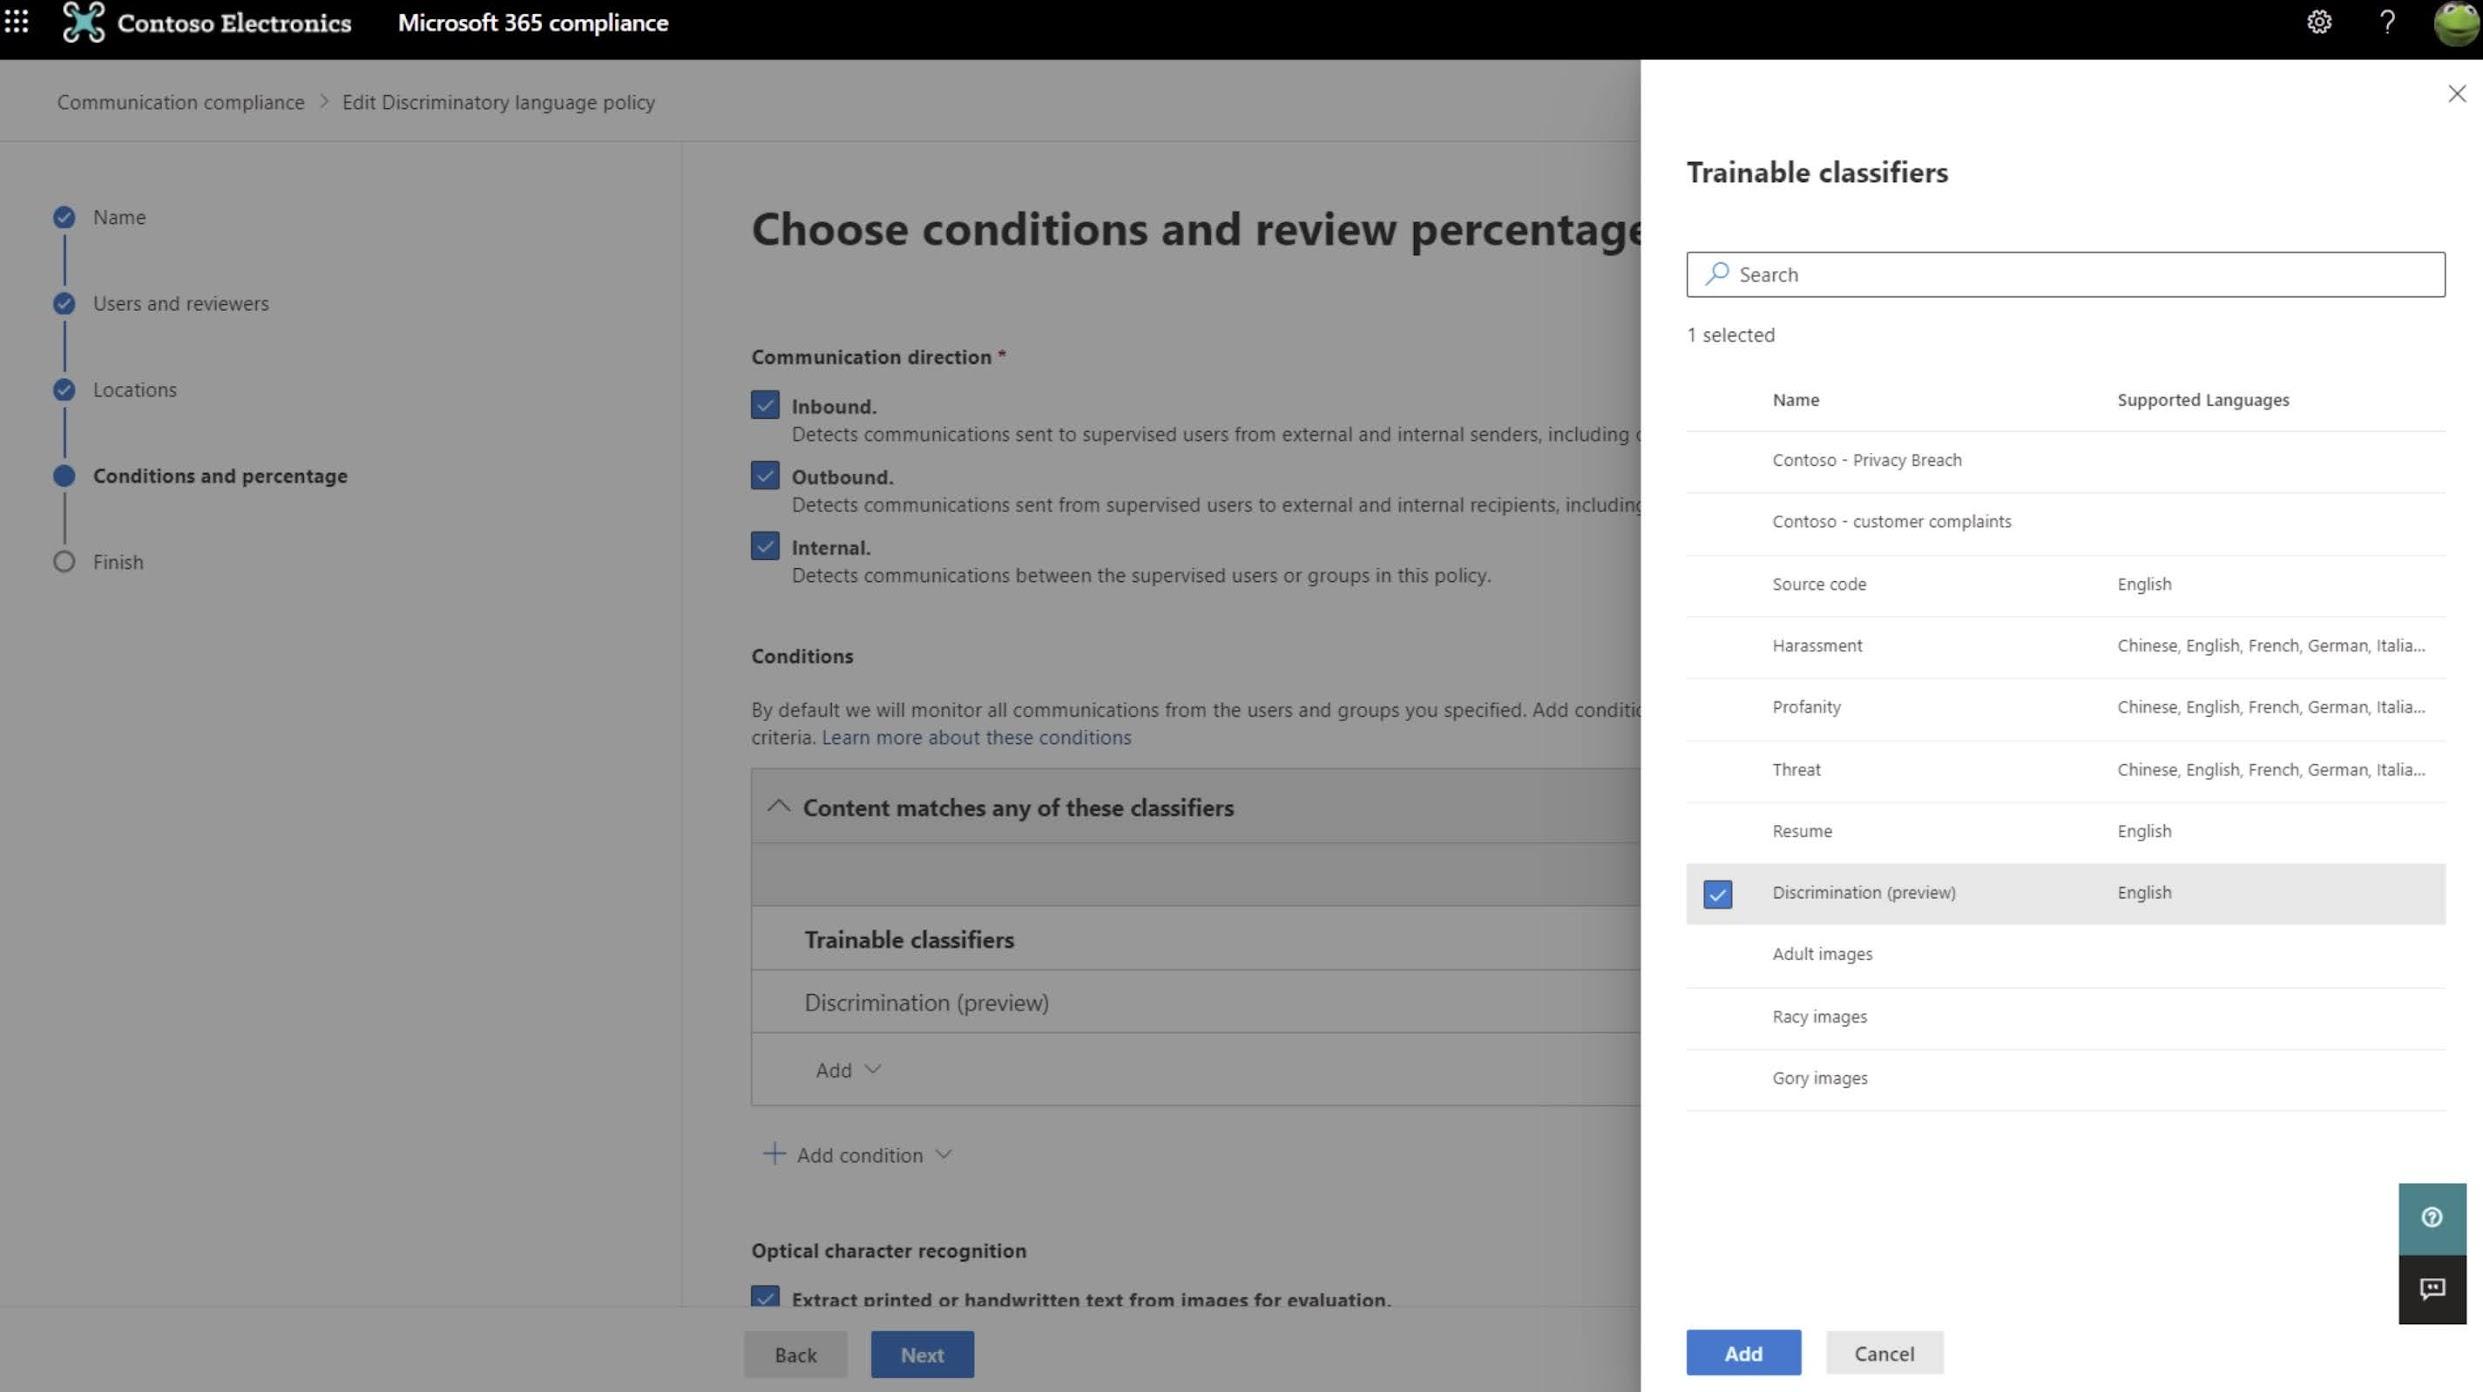 MC268758: Announcing Communication Compliance discrimination classifier for Microsoft 365 (preview)